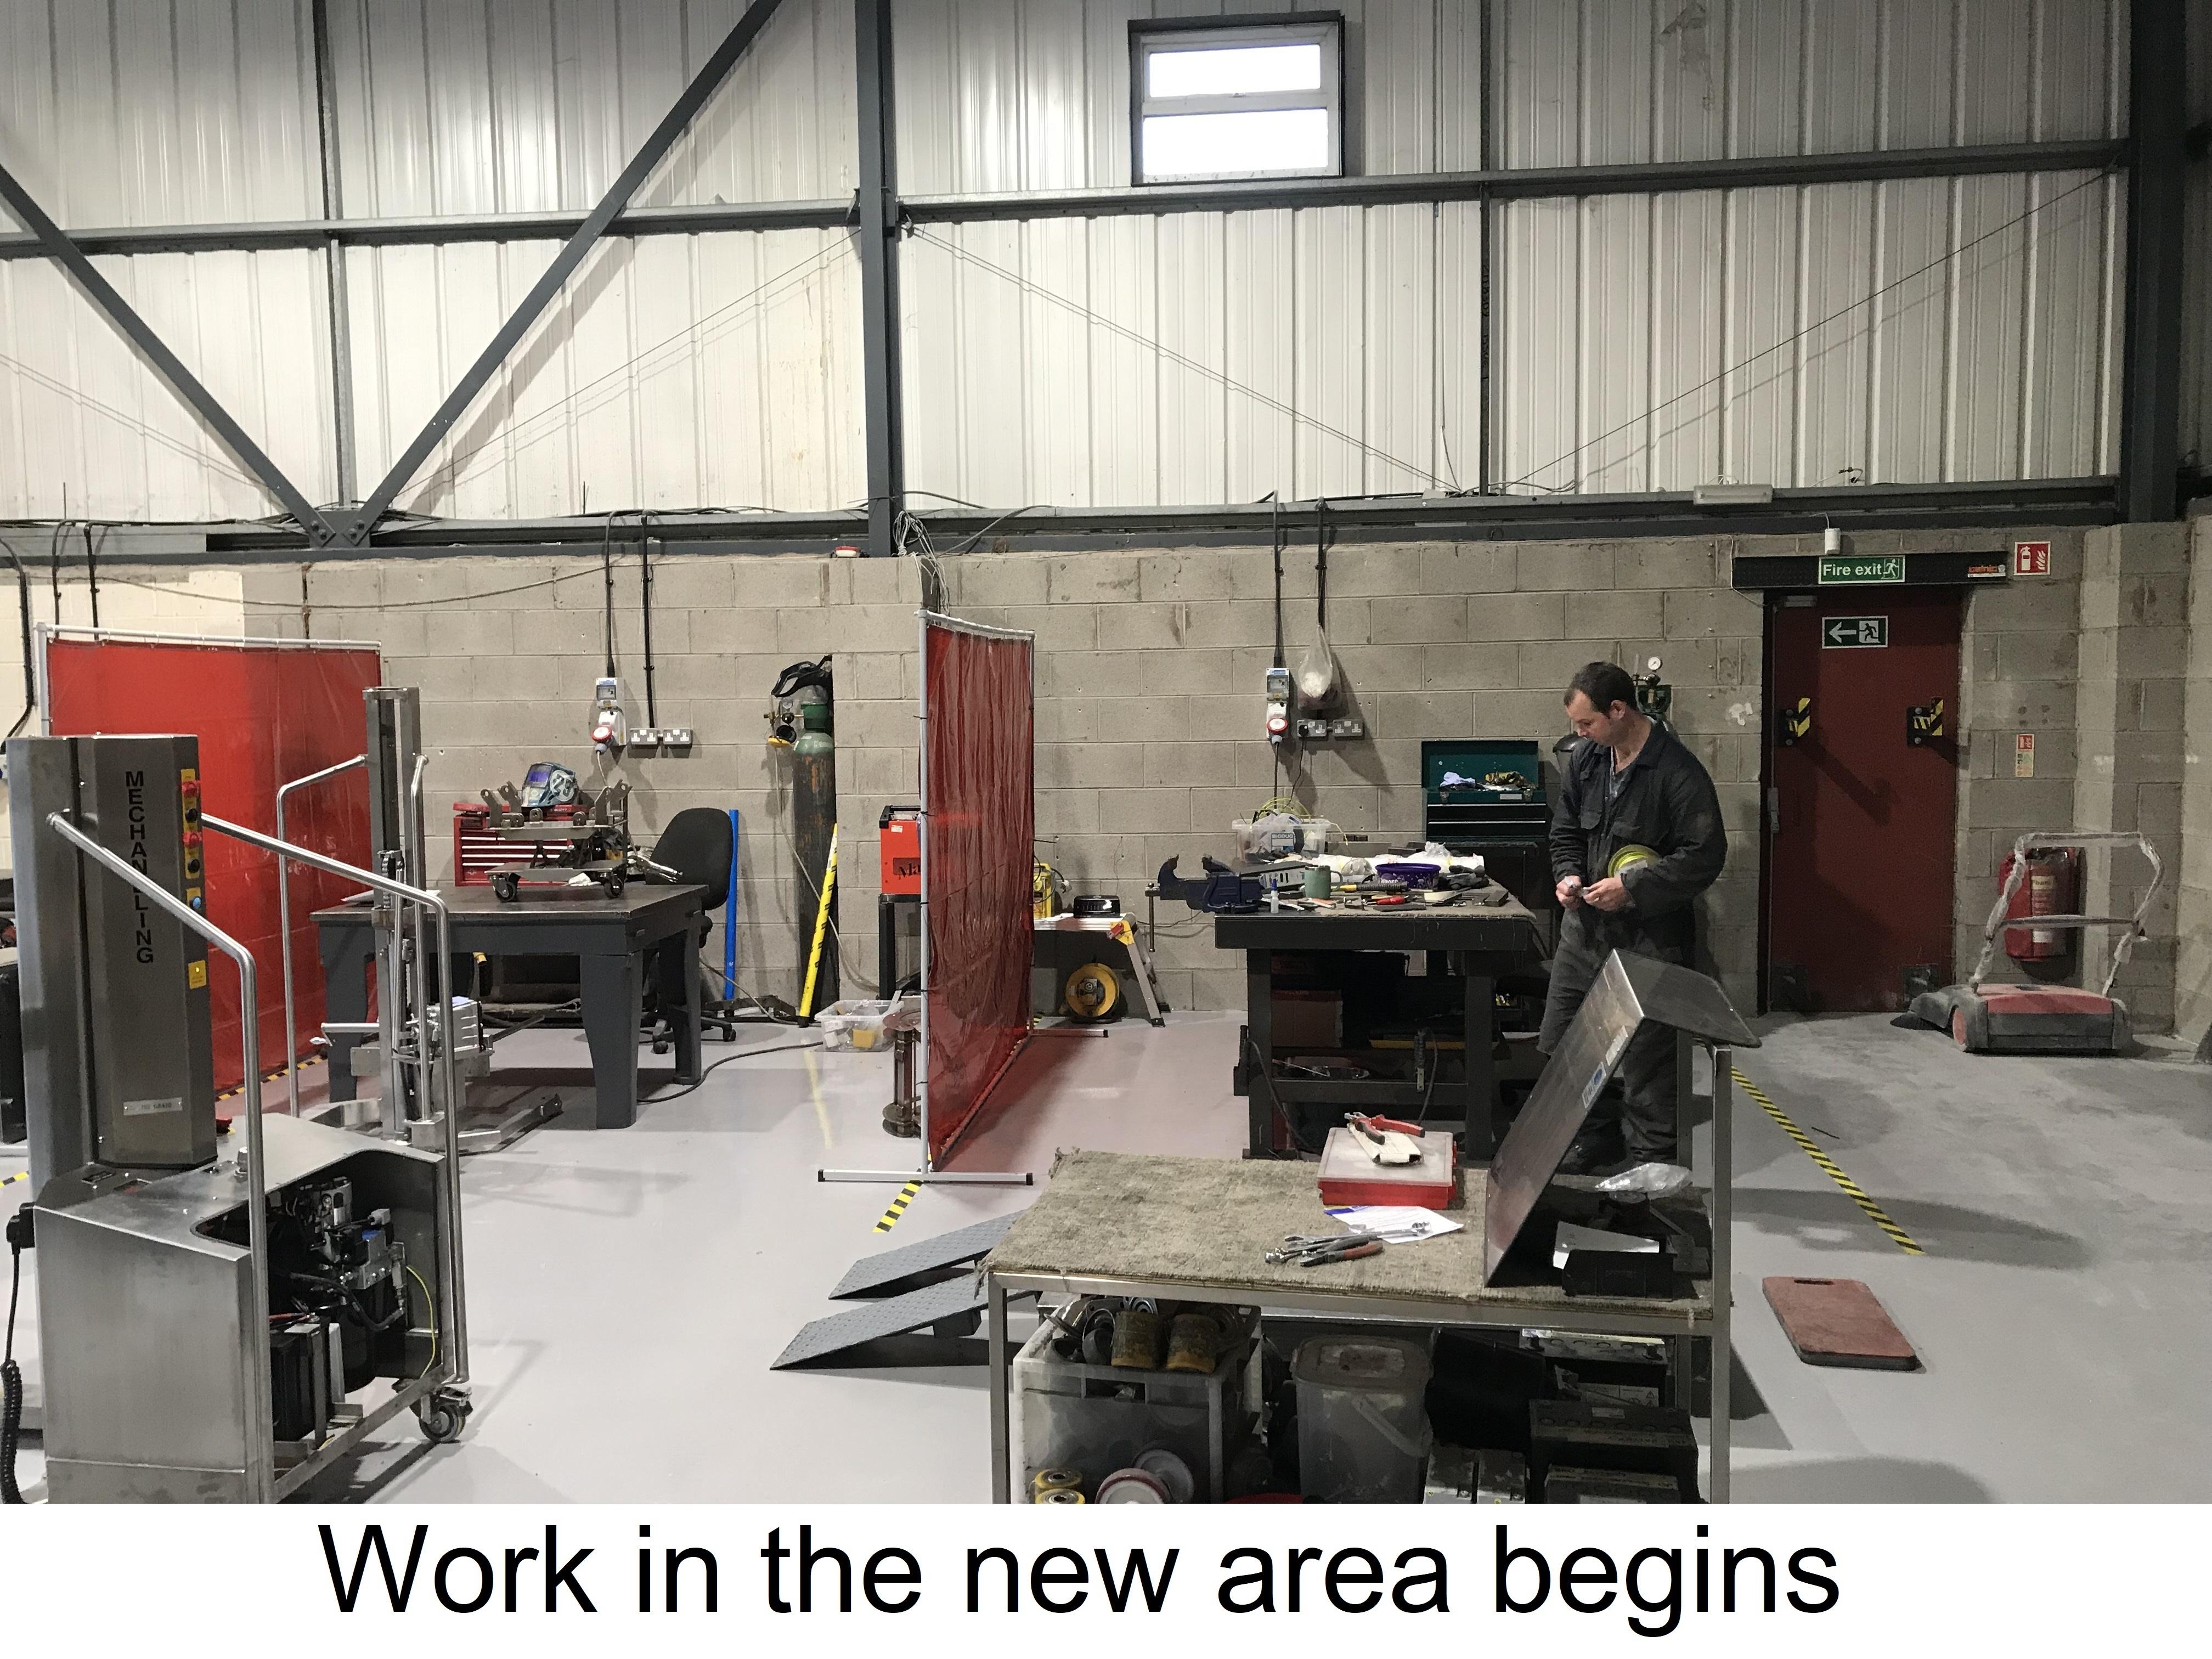 https://0201.nccdn.net/4_2/000/000/083/84e/12.-work-in-the-new-area-begins.jpg